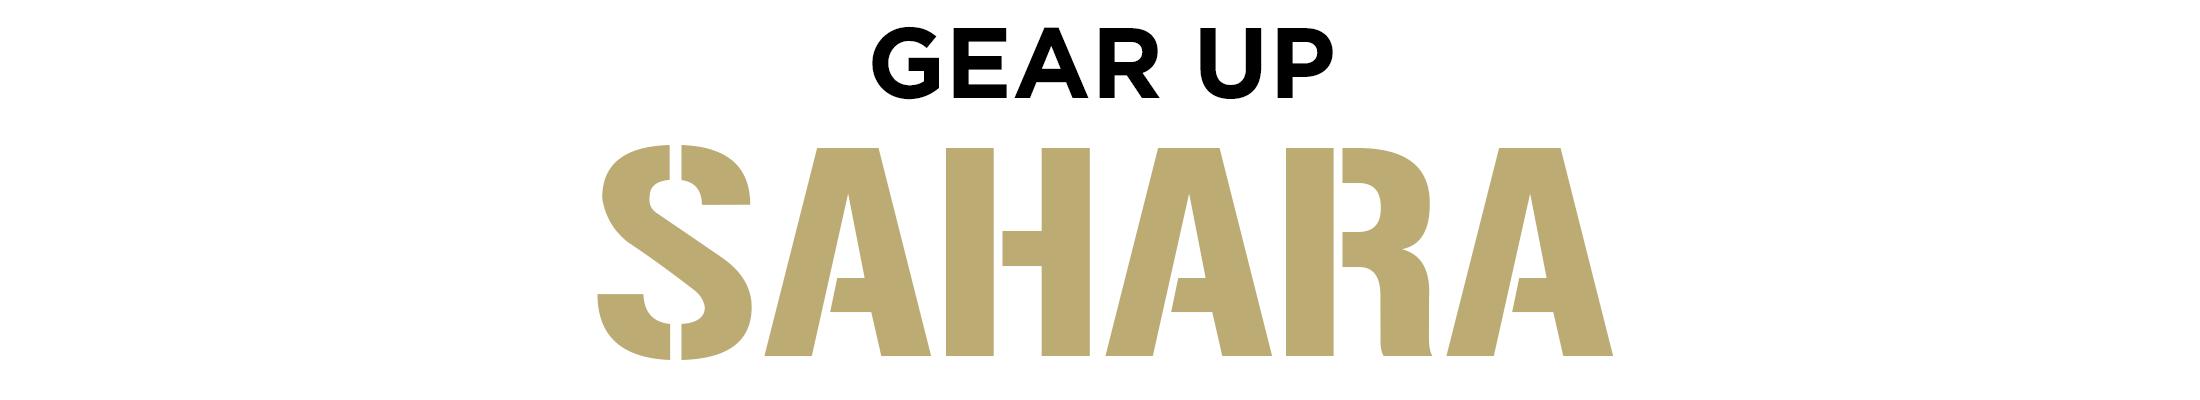 header-text